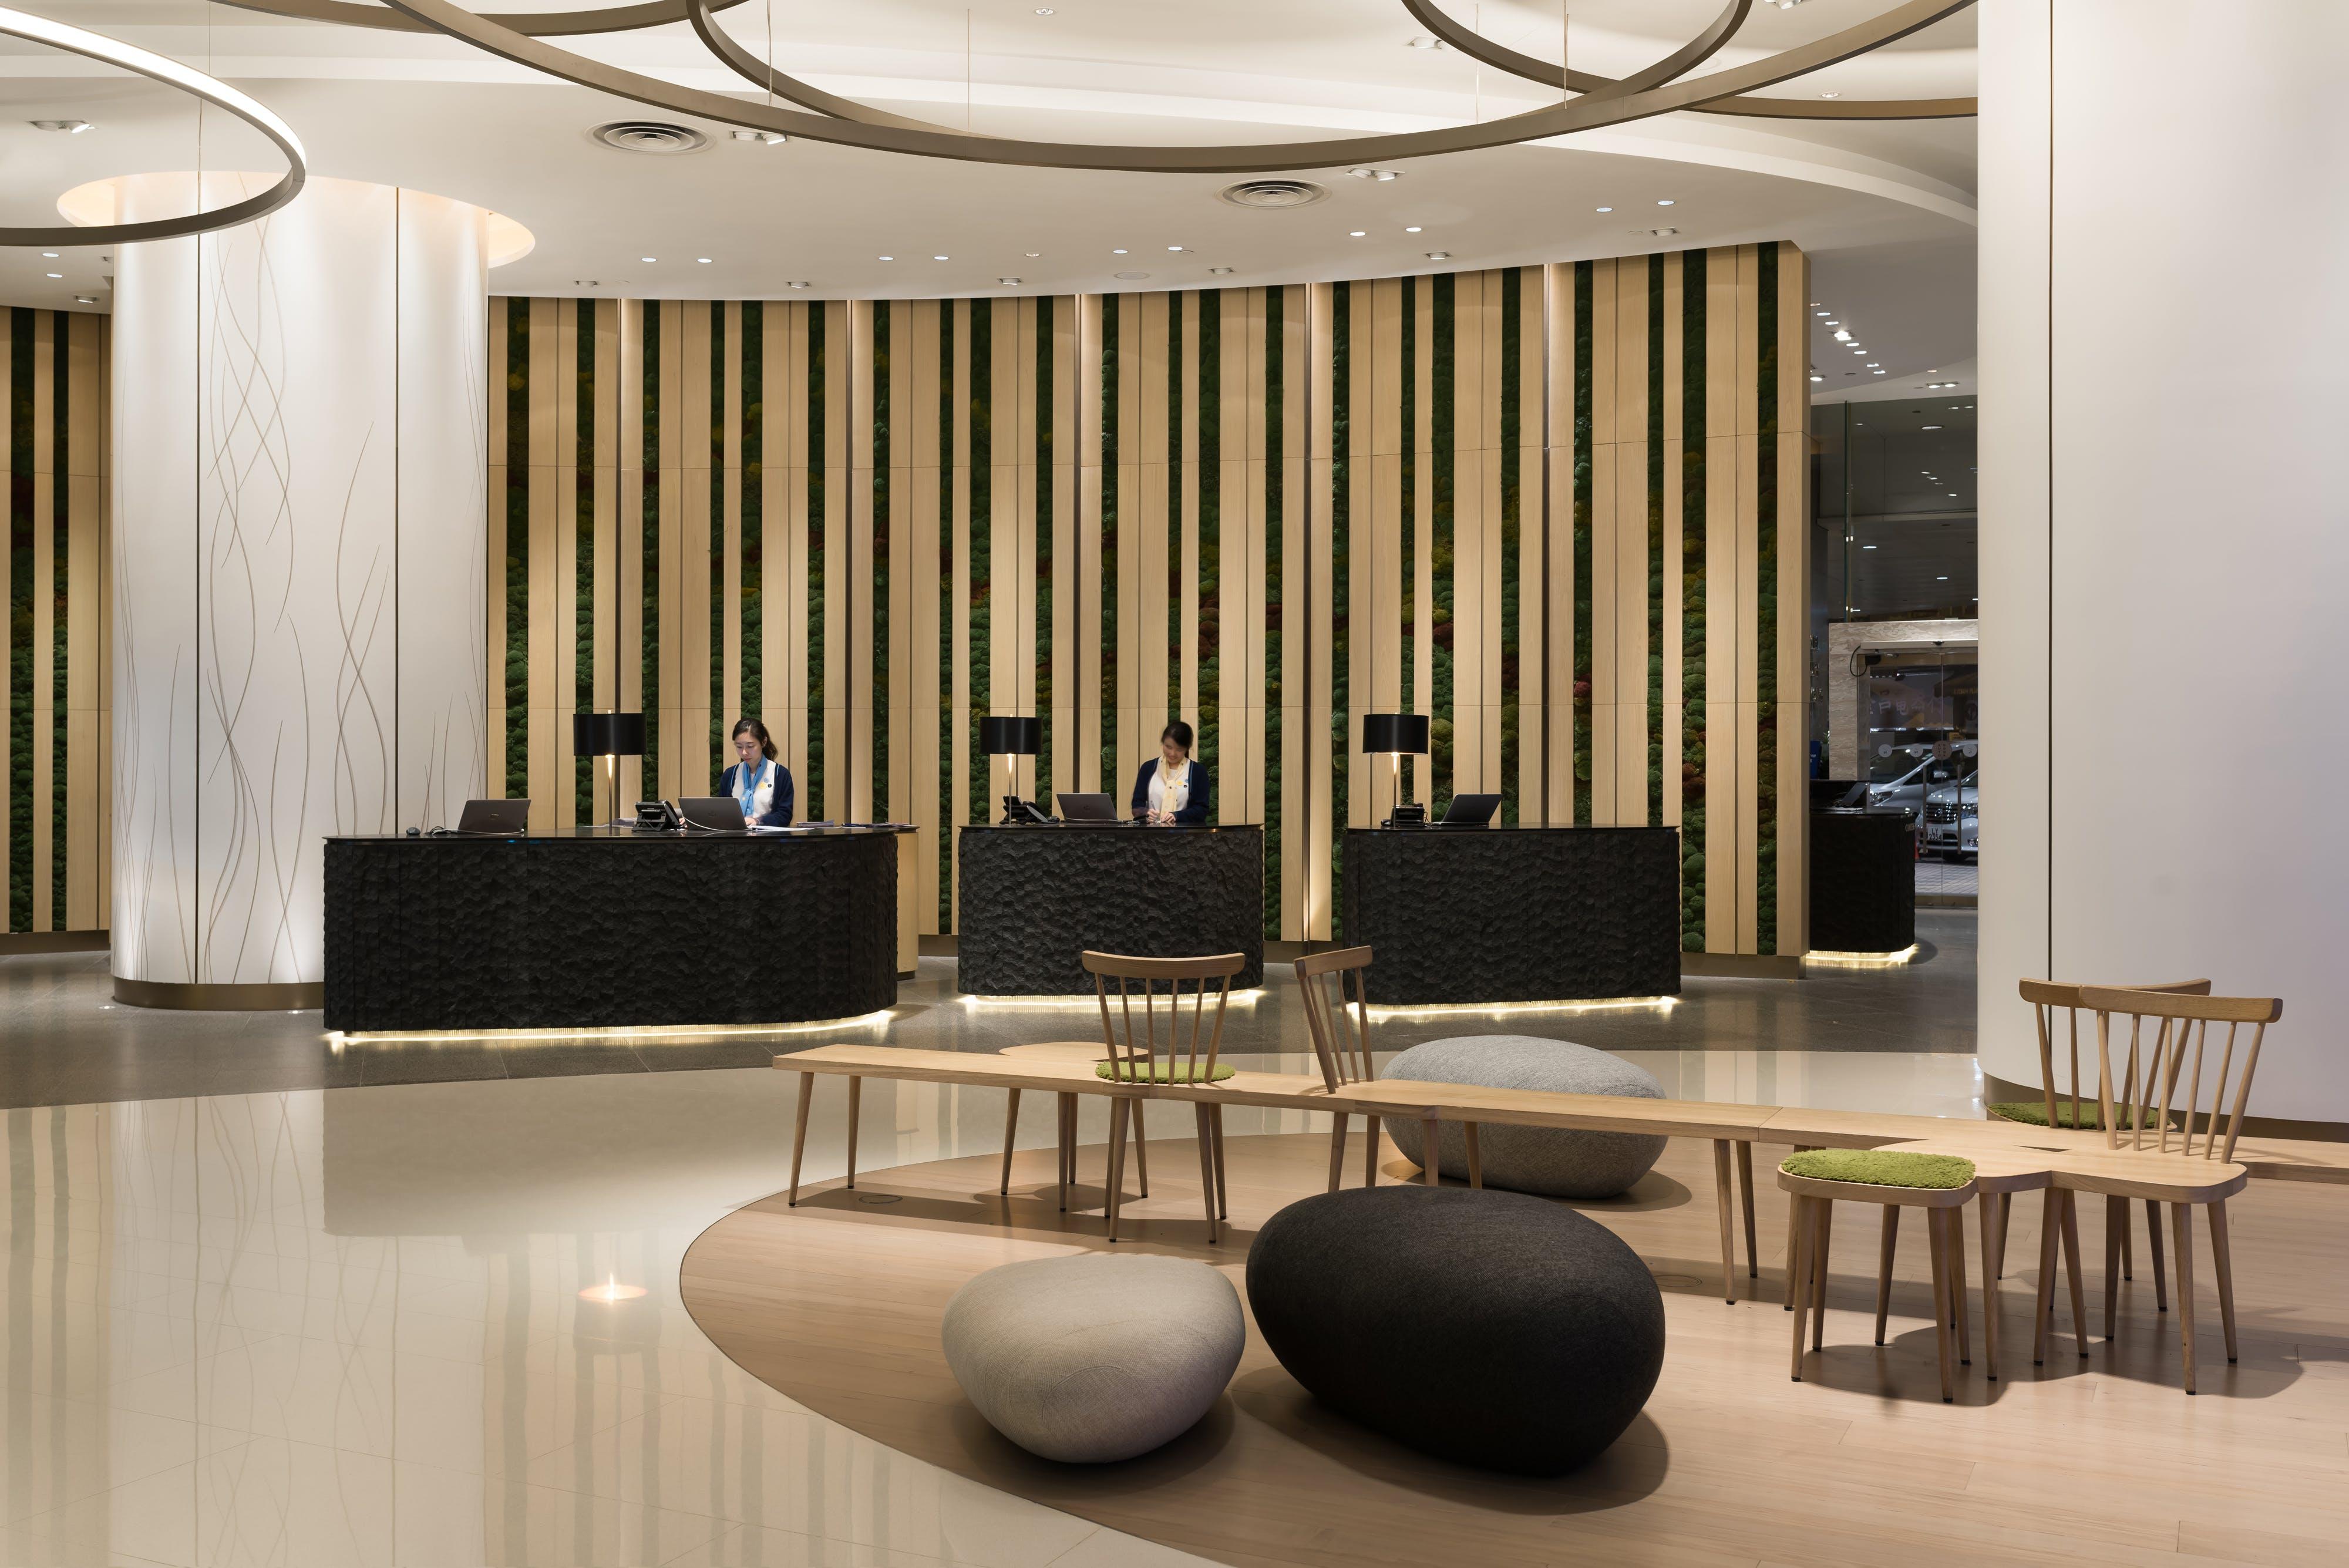 Aedas Interiors creates a minimal aesthetic with sculptural forms